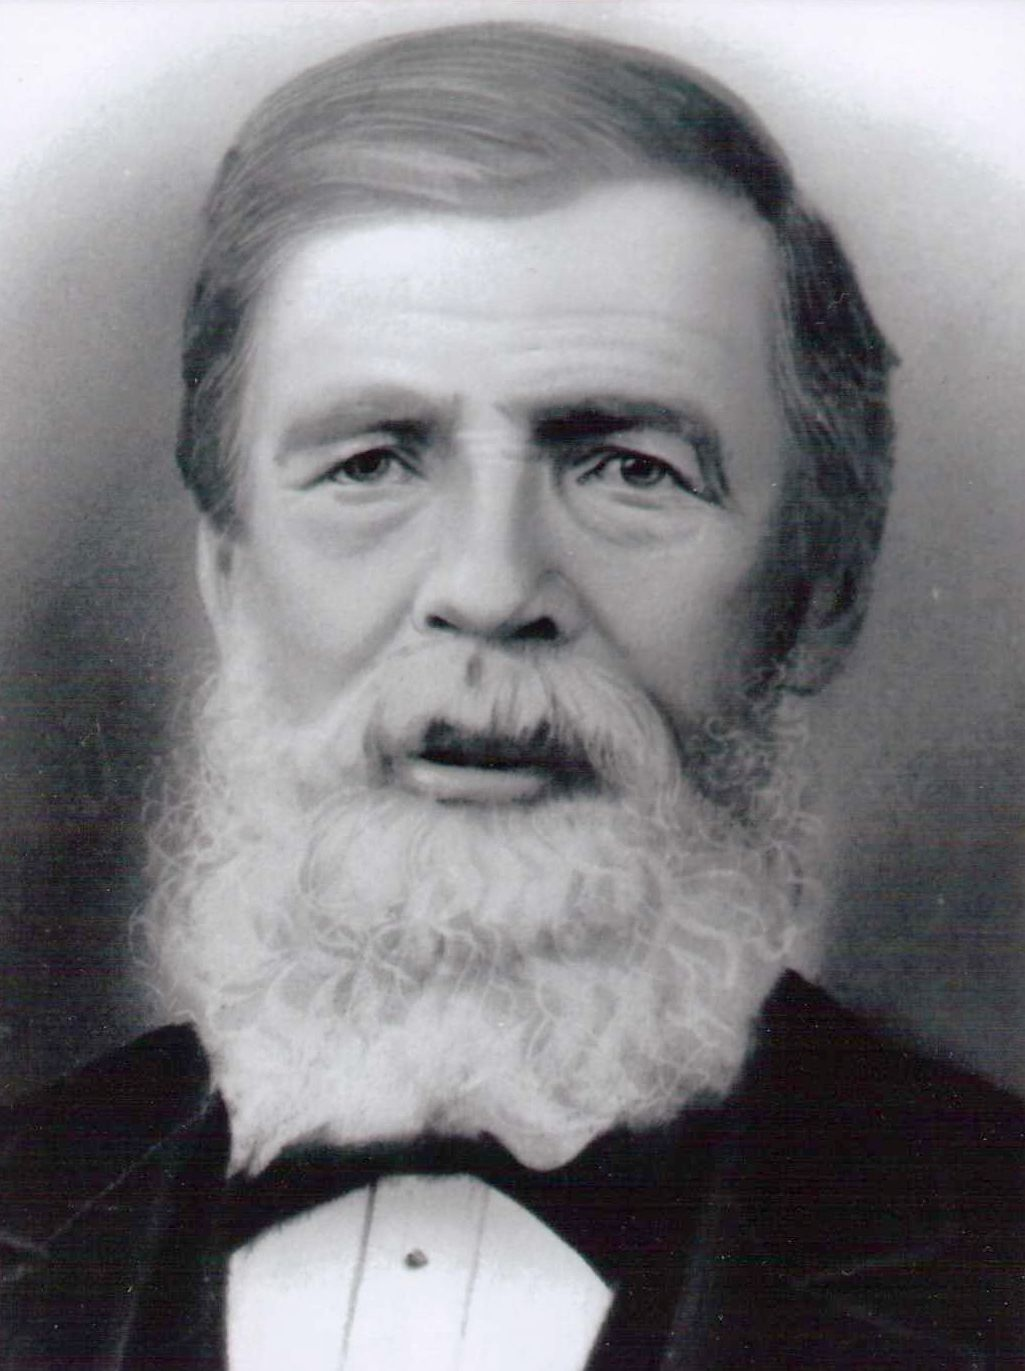 Fuhrmeister, Friedrick William Christoph